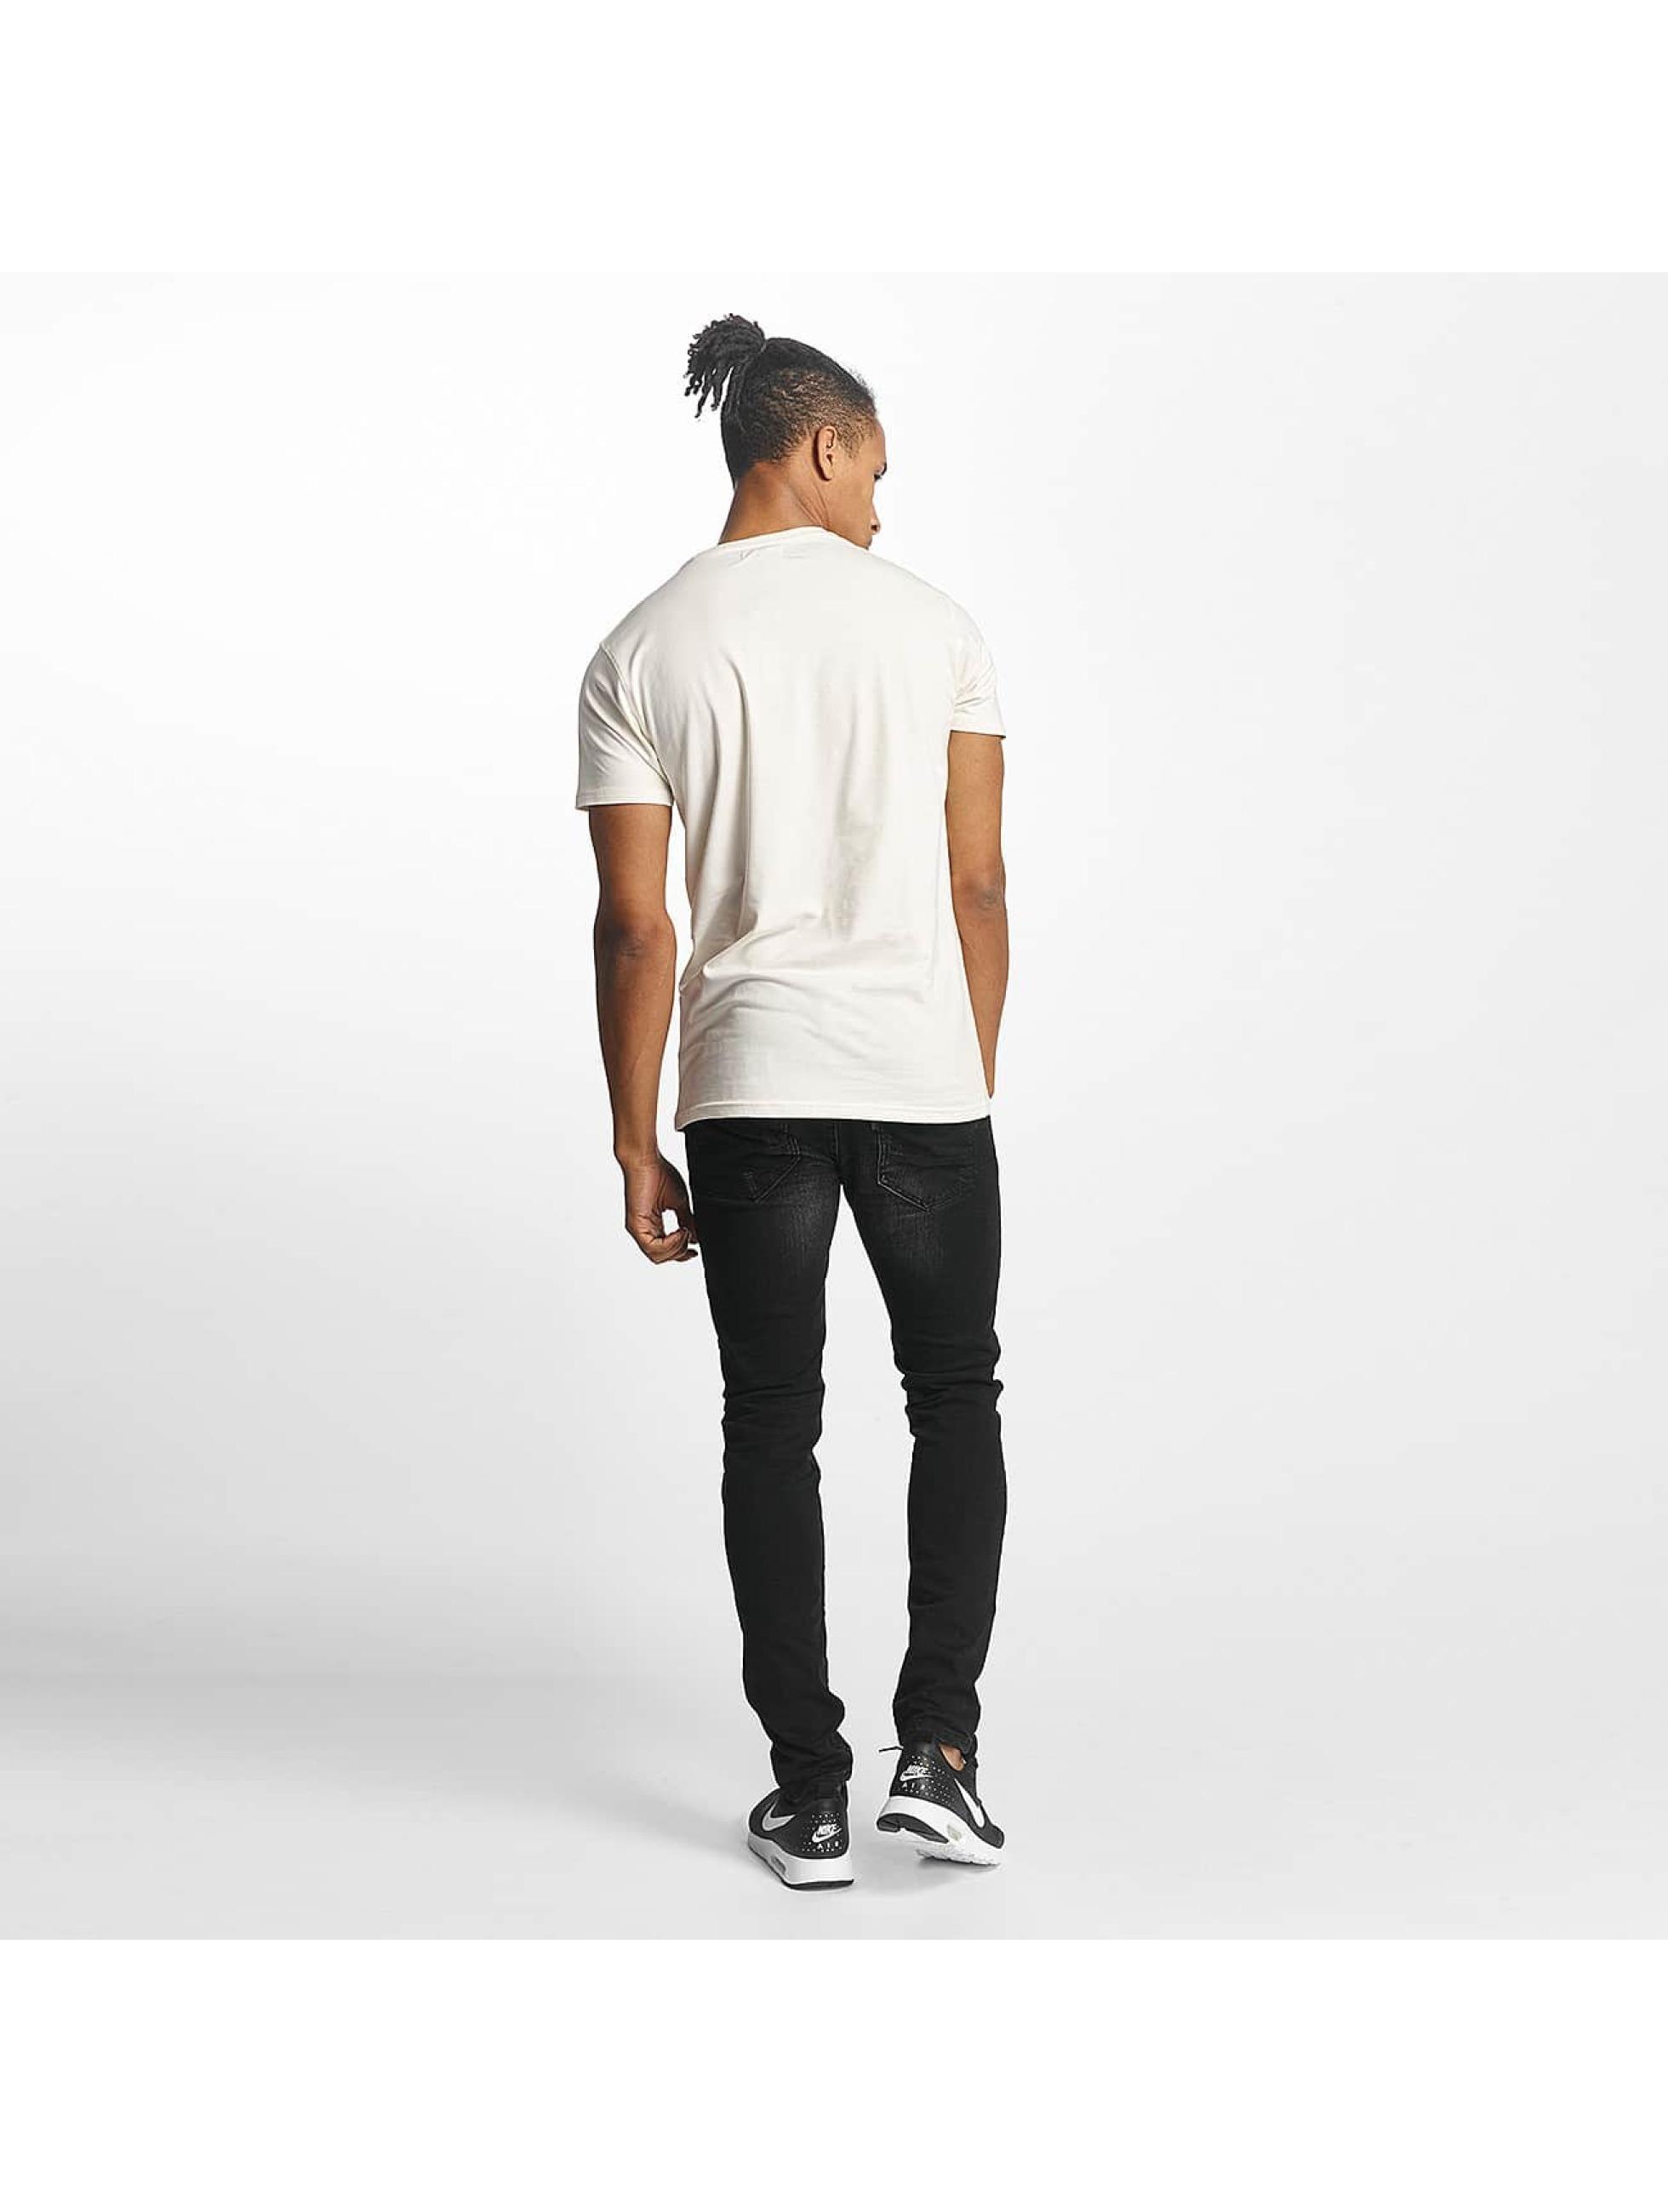 Paris Premium T-Shirt Attitude is everything white